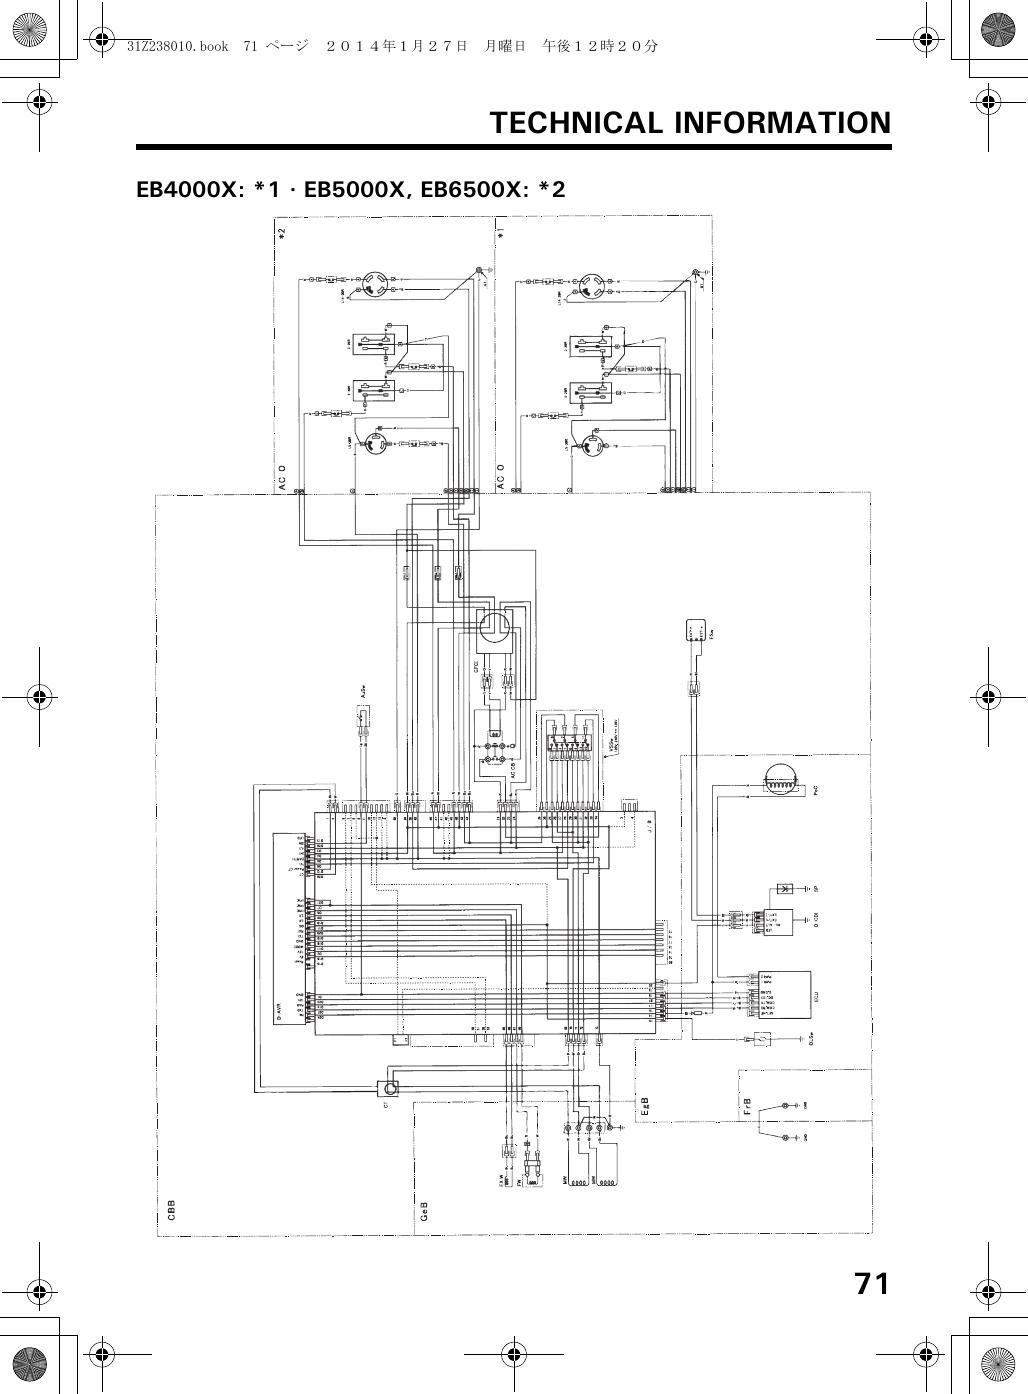 Wiring       Diagram    Eb6500x  Gallery 4k Wallpapers